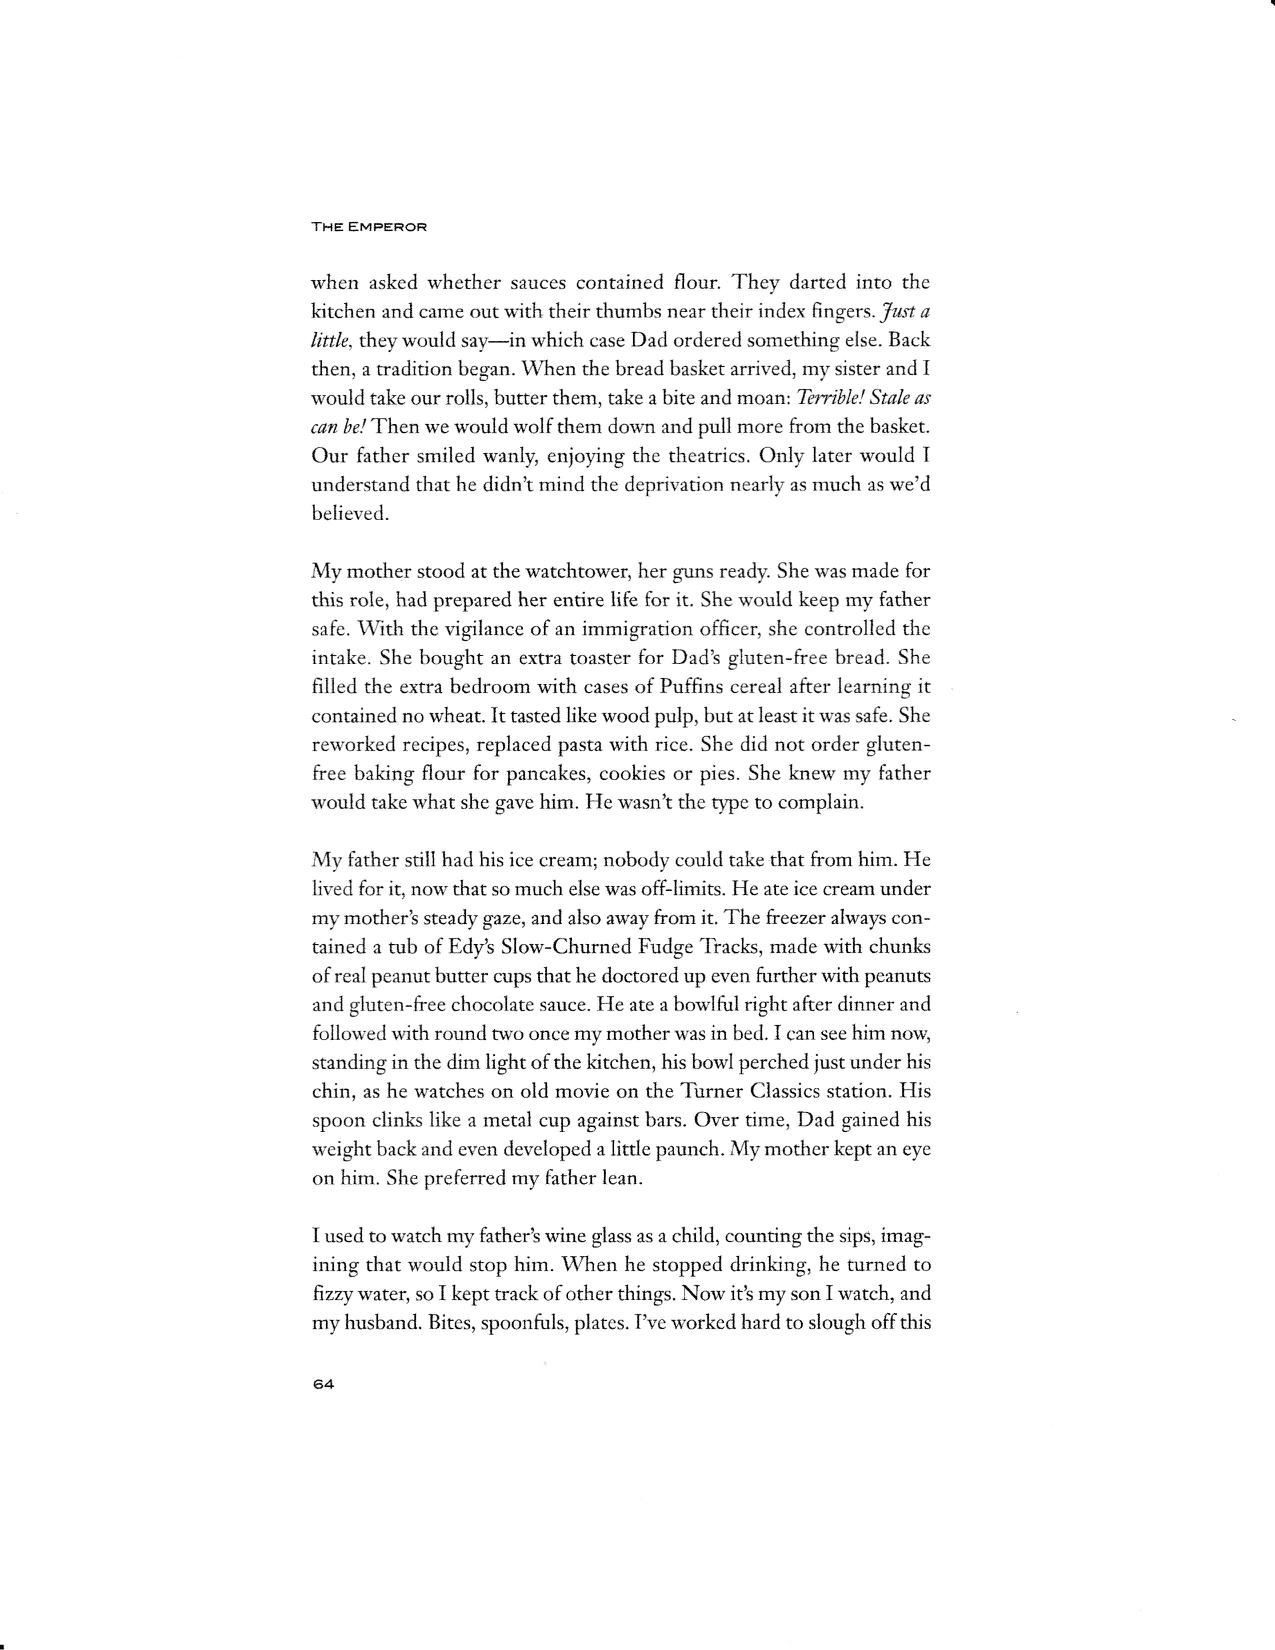 Tahoma_Literary_Review_The_Emperor 08.jpg